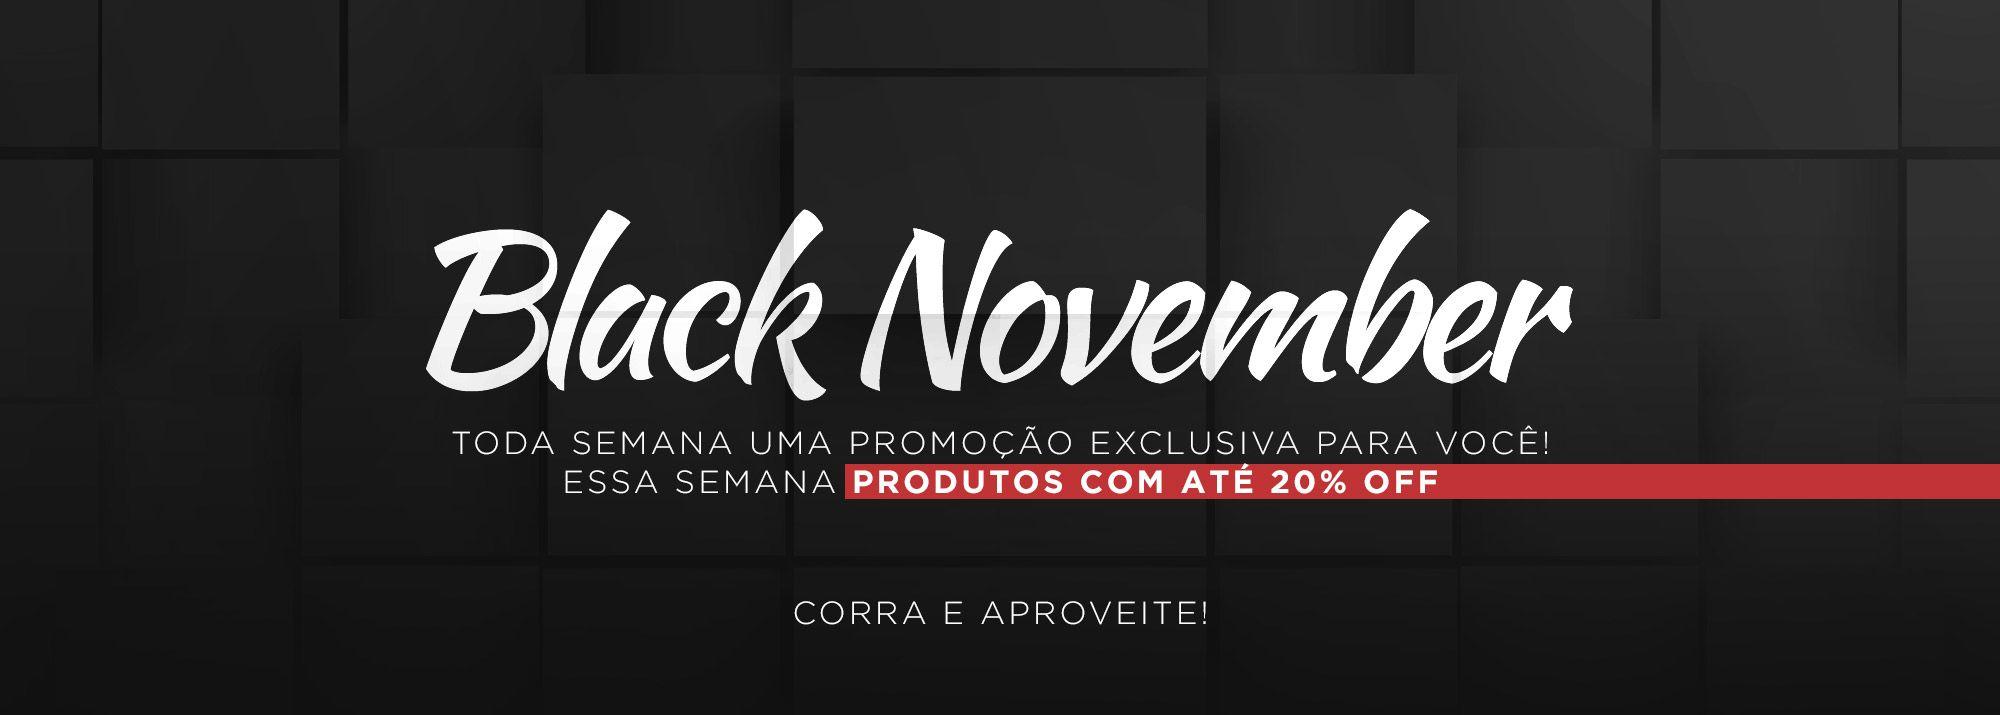 Banner Black